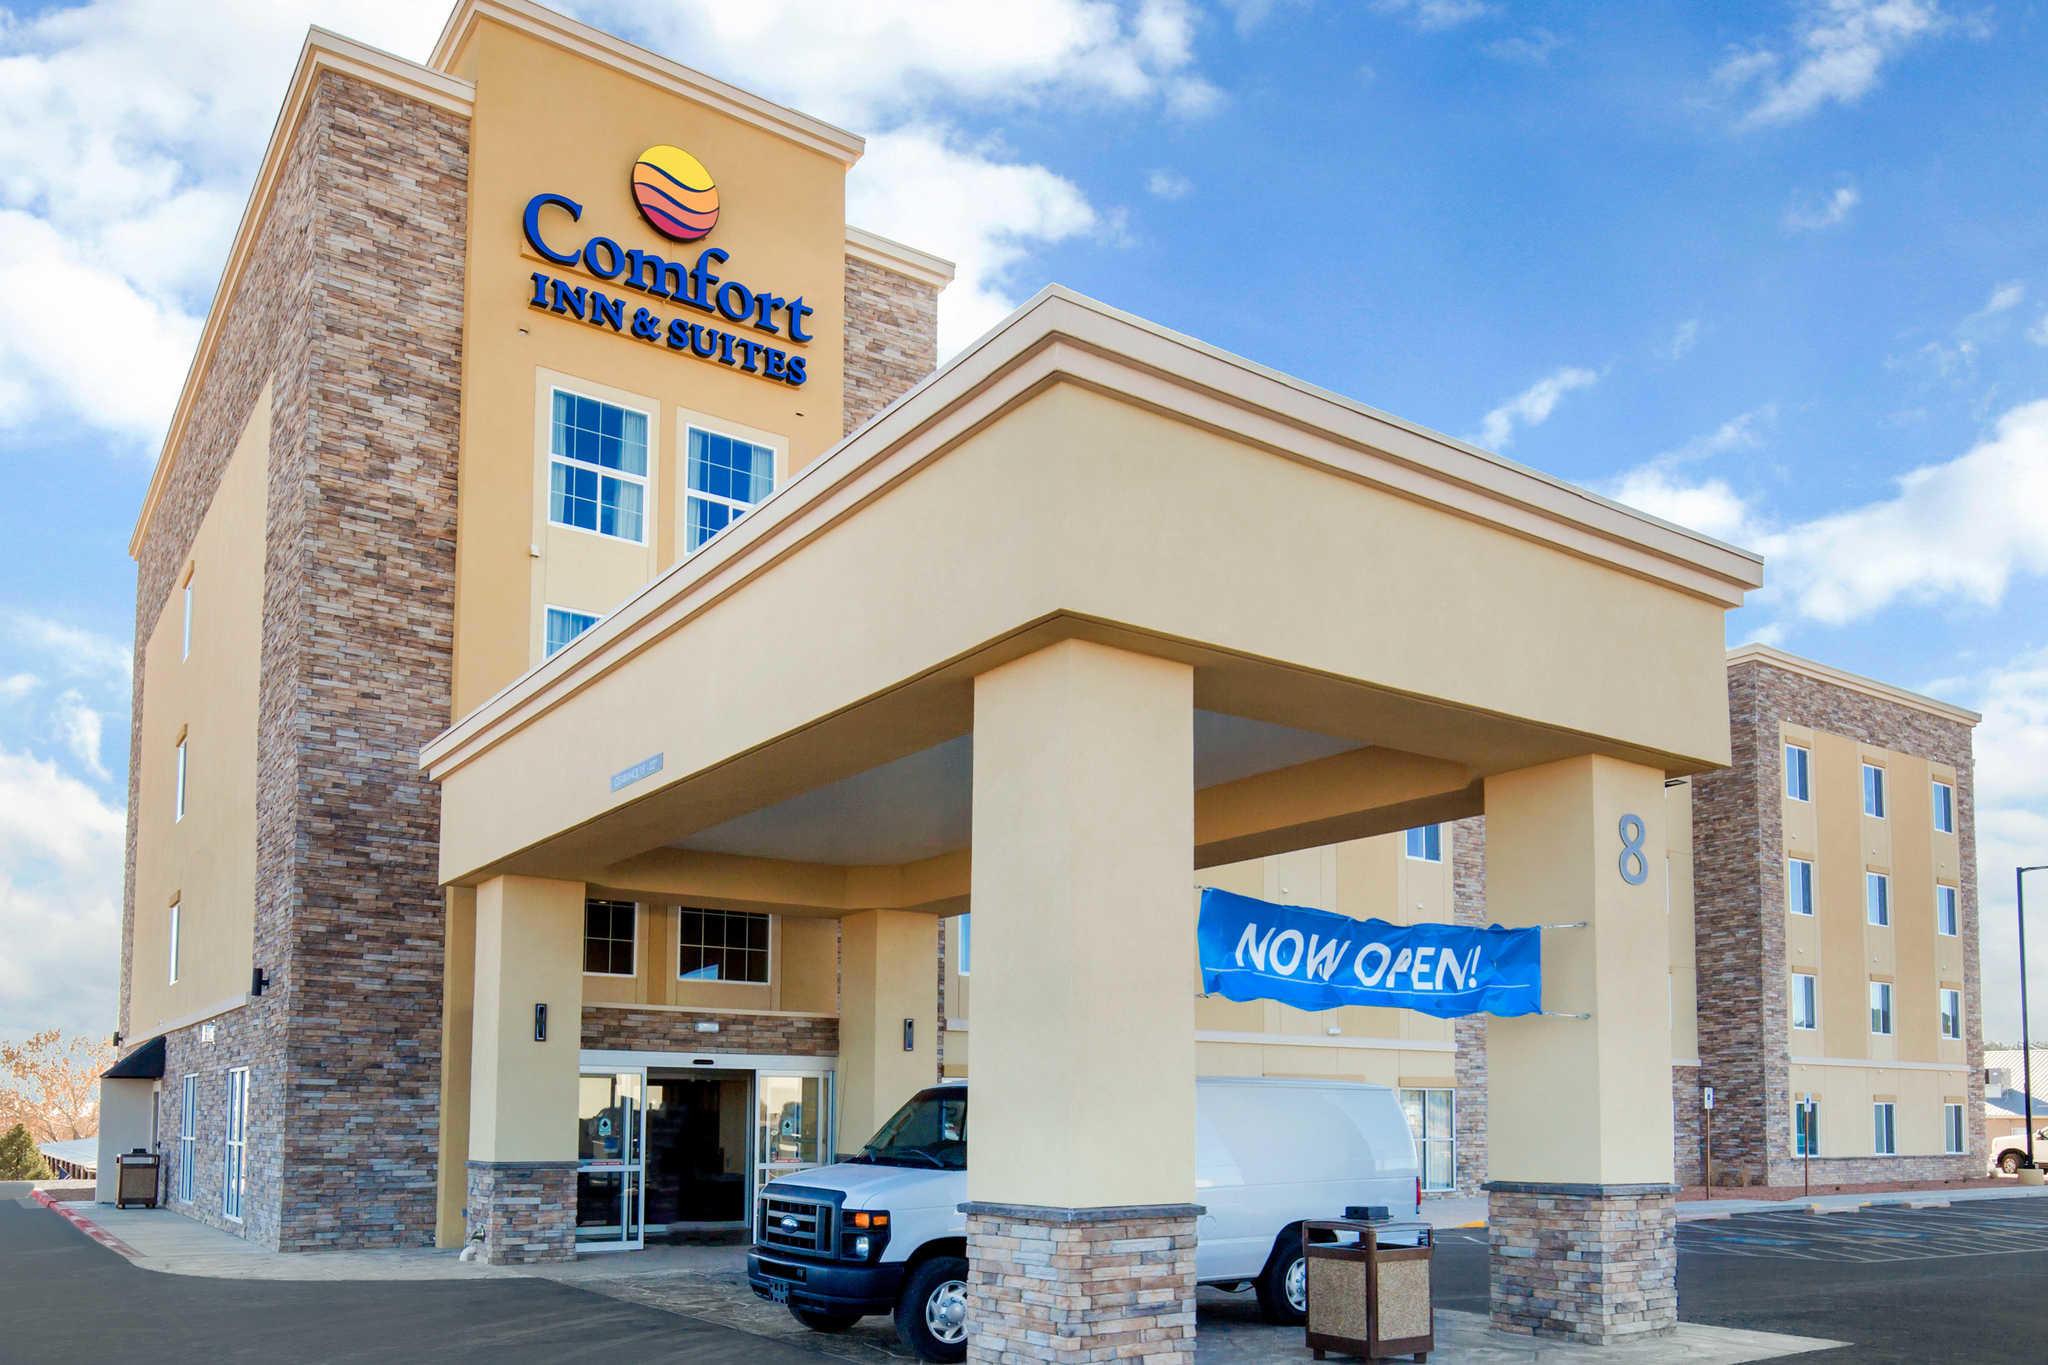 Comfort Inn  U0026 Suites In Edgewood  Nm 87015